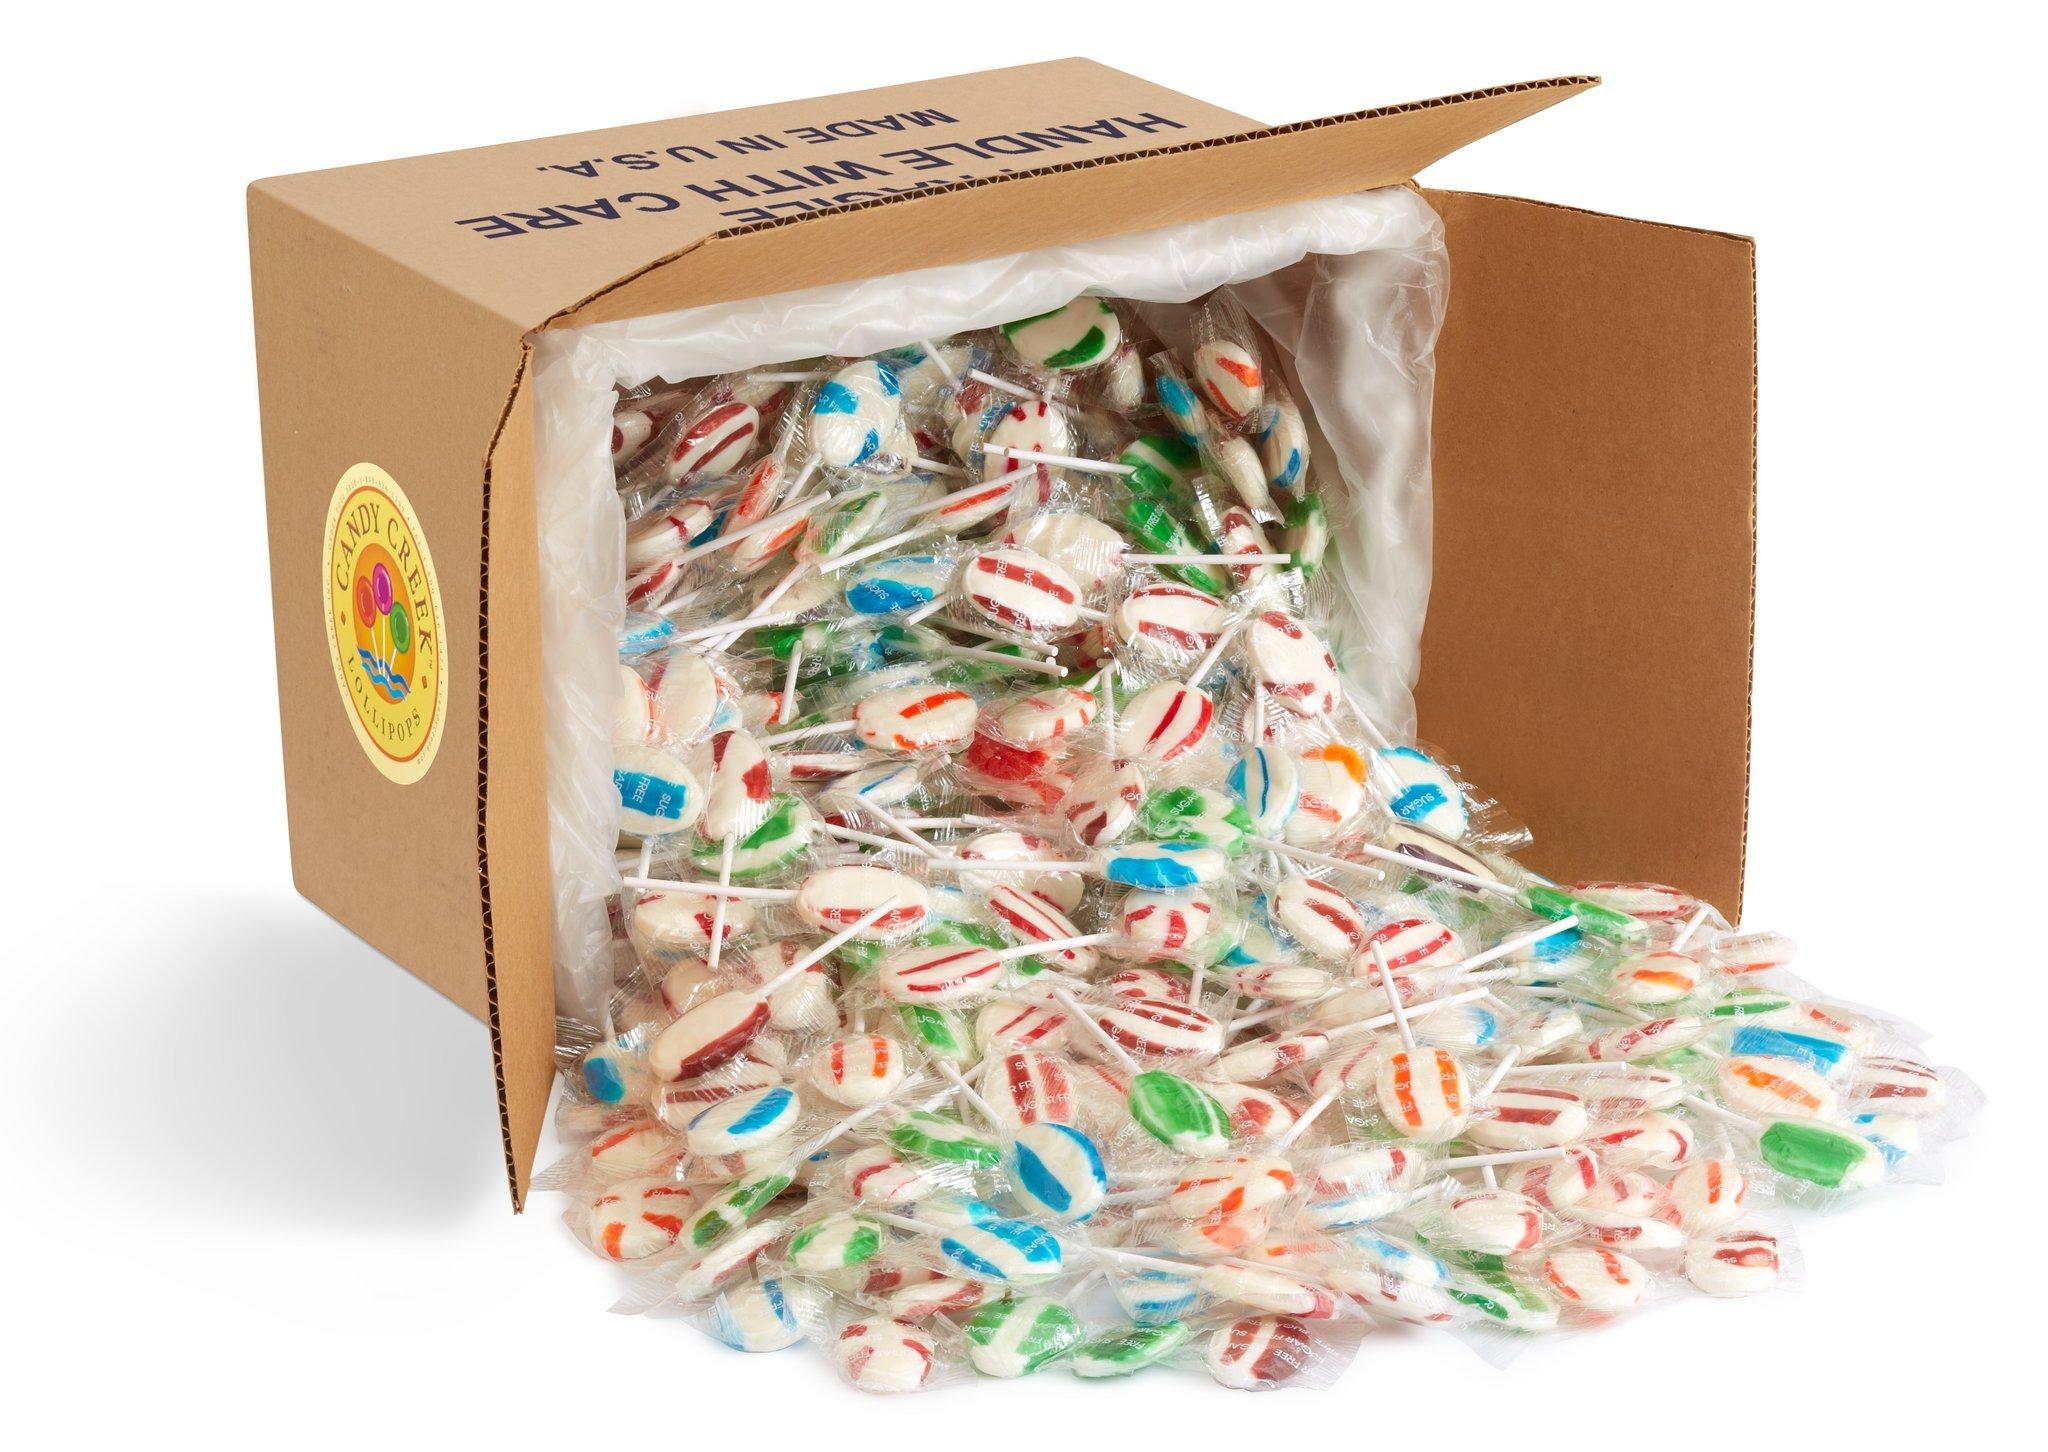 Oval Sugar Free Fruit Zany Lollipops by Candy Creek, Bulk 12 lb. Carton, Assorted Flavors by Candy Creek Lollipops